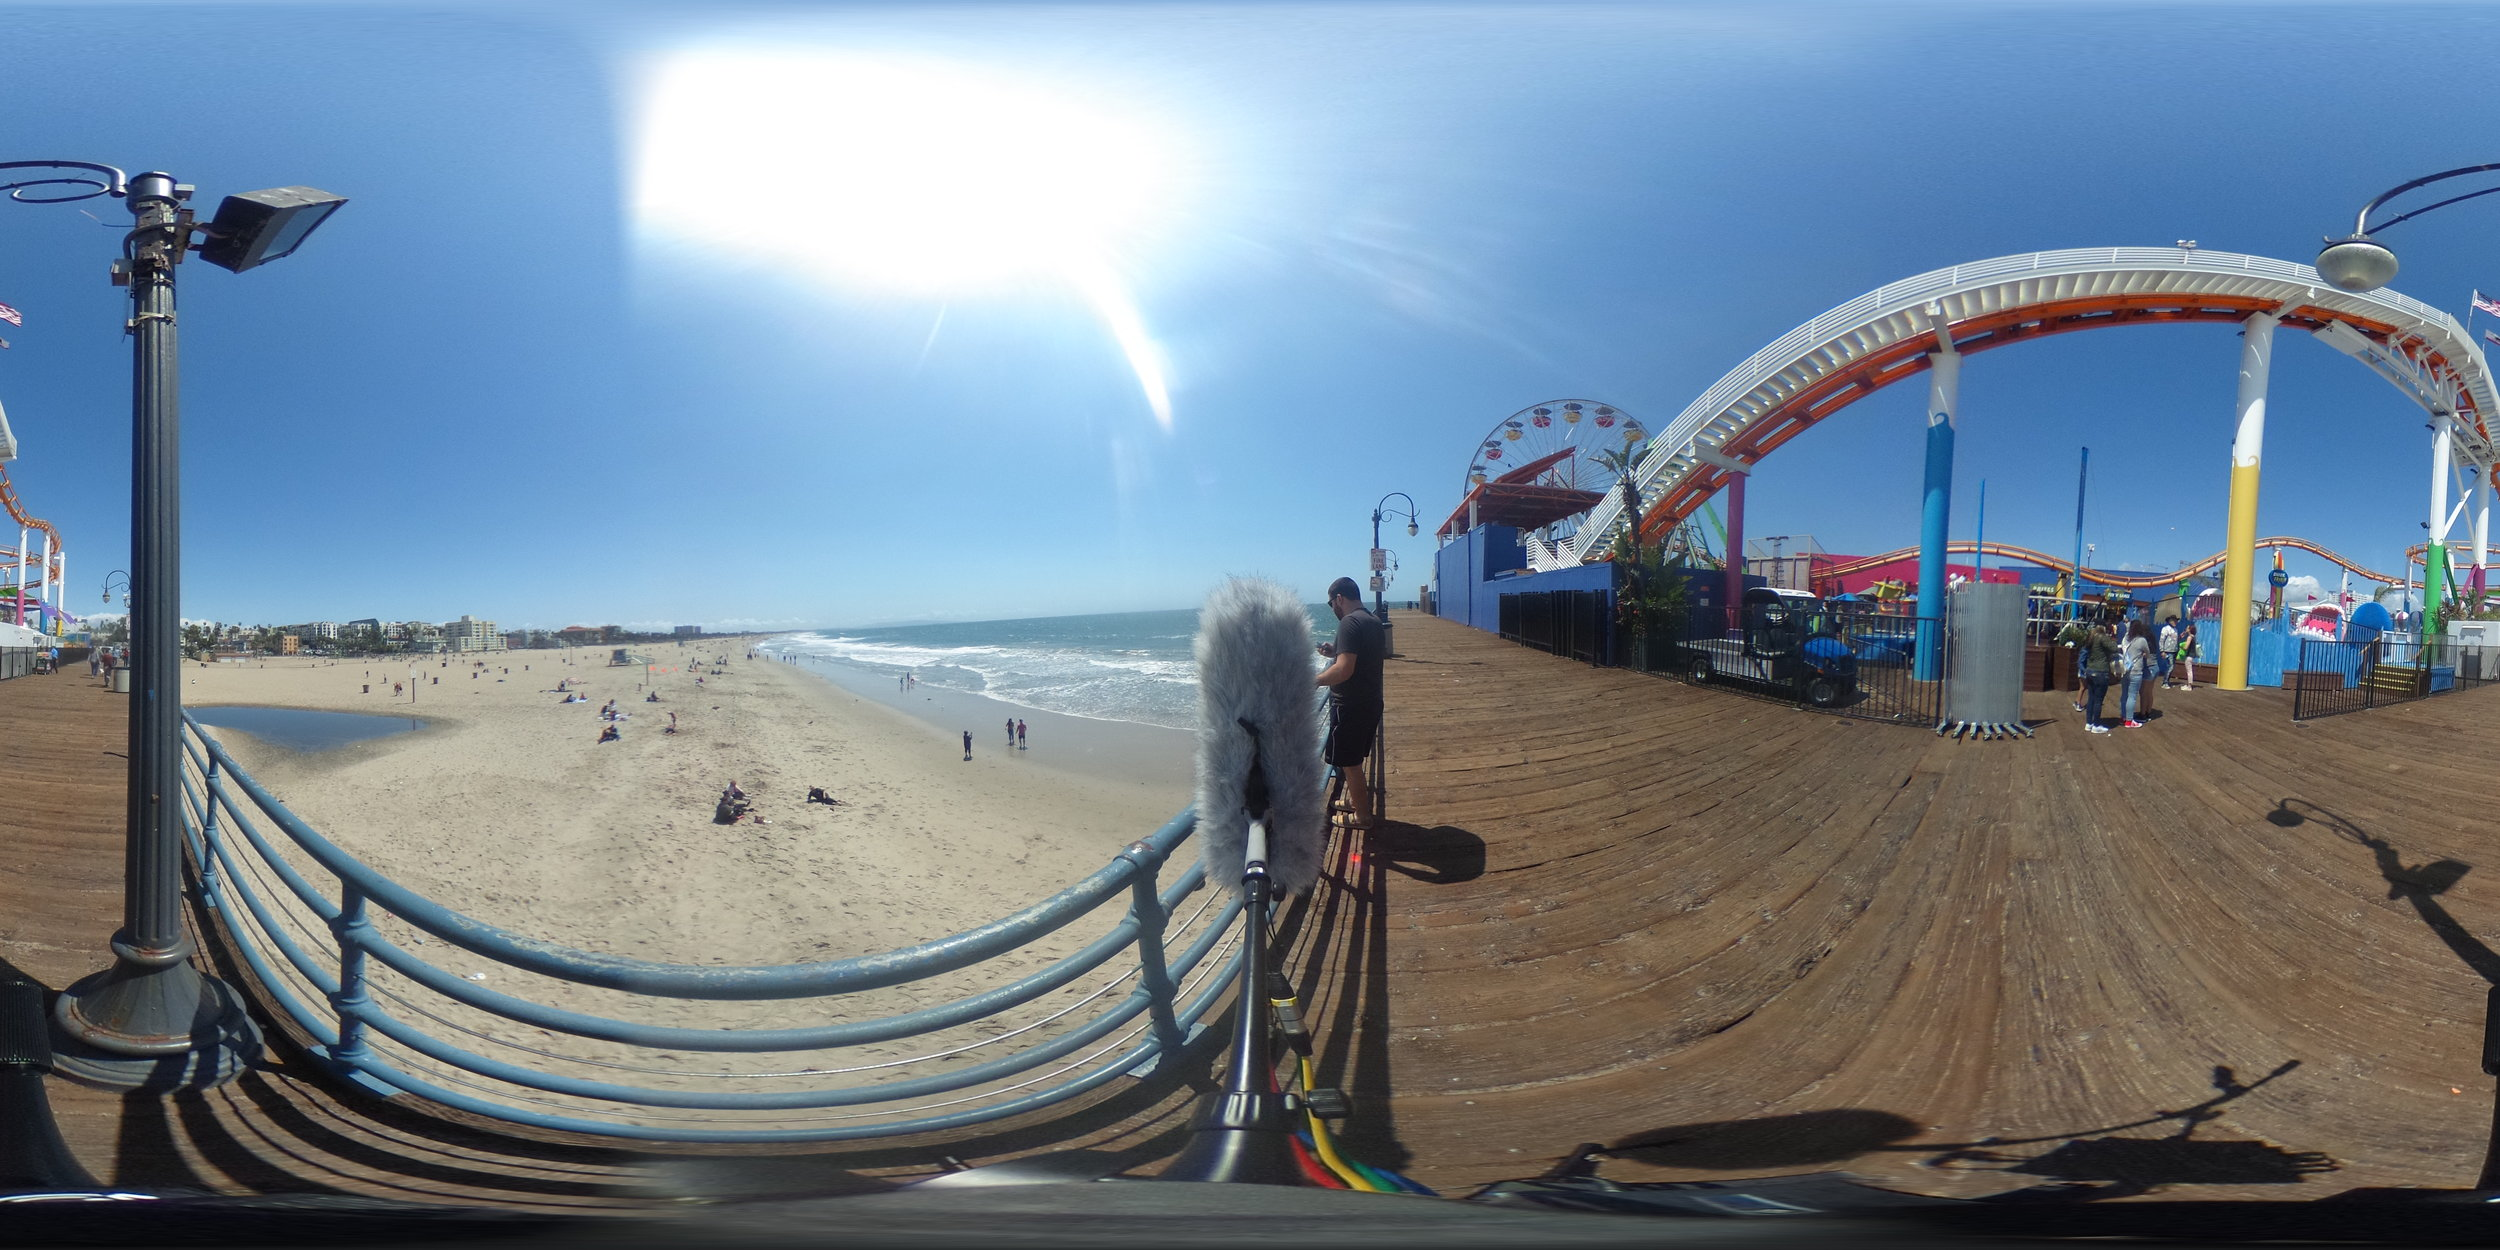 EXT_Day_Beach_Pier_AmusementPark_RollercoasterBys_MediumDistanceChildrenScreaming_VeryDistantWaves_PedestrianBys_JPEG.JPG